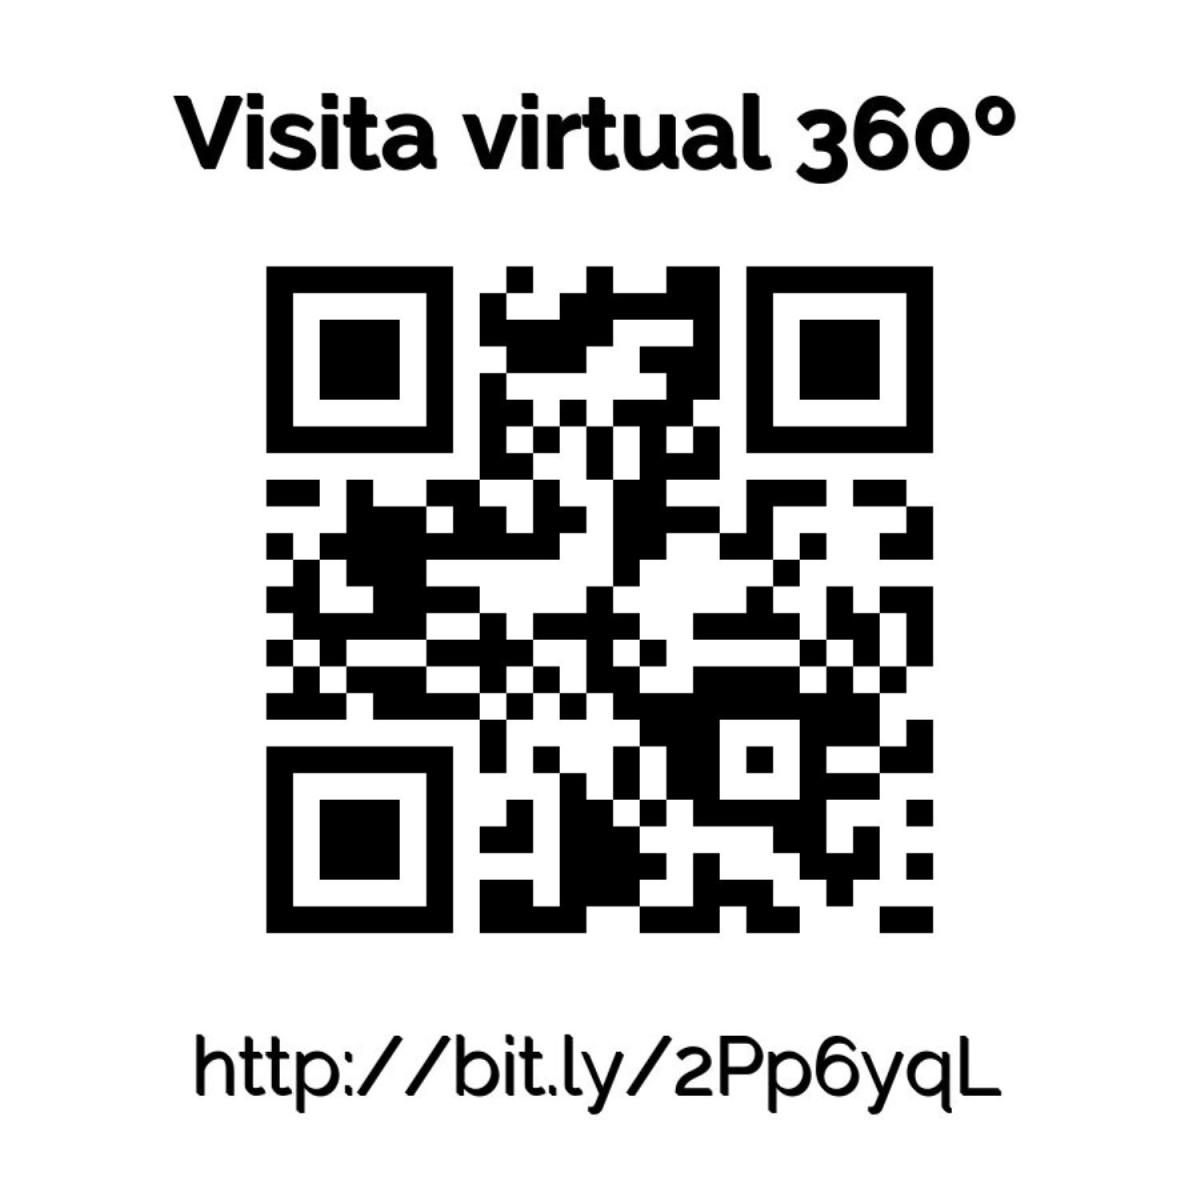 3408-03726